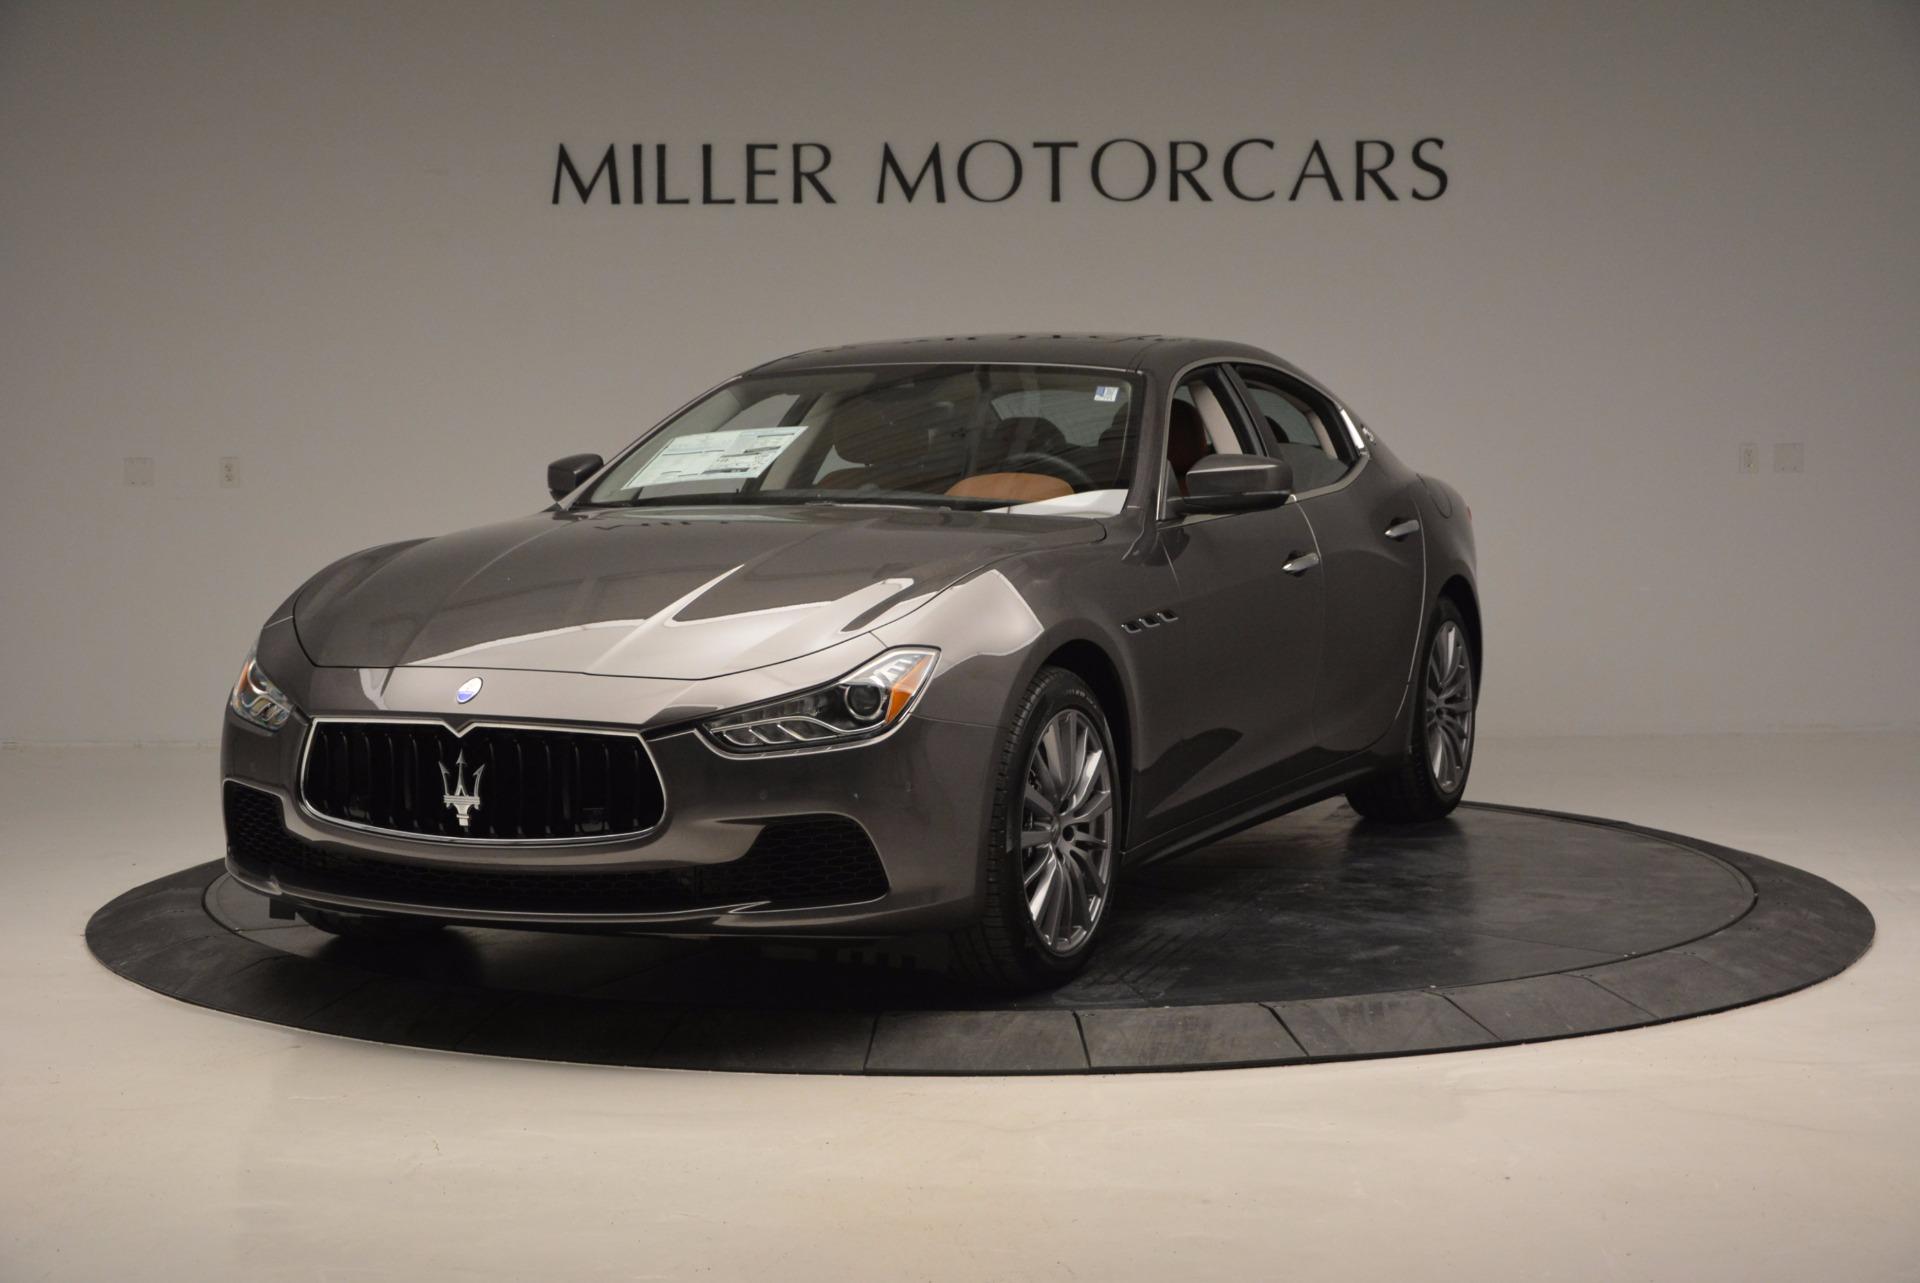 New 2017 Maserati Ghibli S Q4 For Sale In Westport, CT 715_main